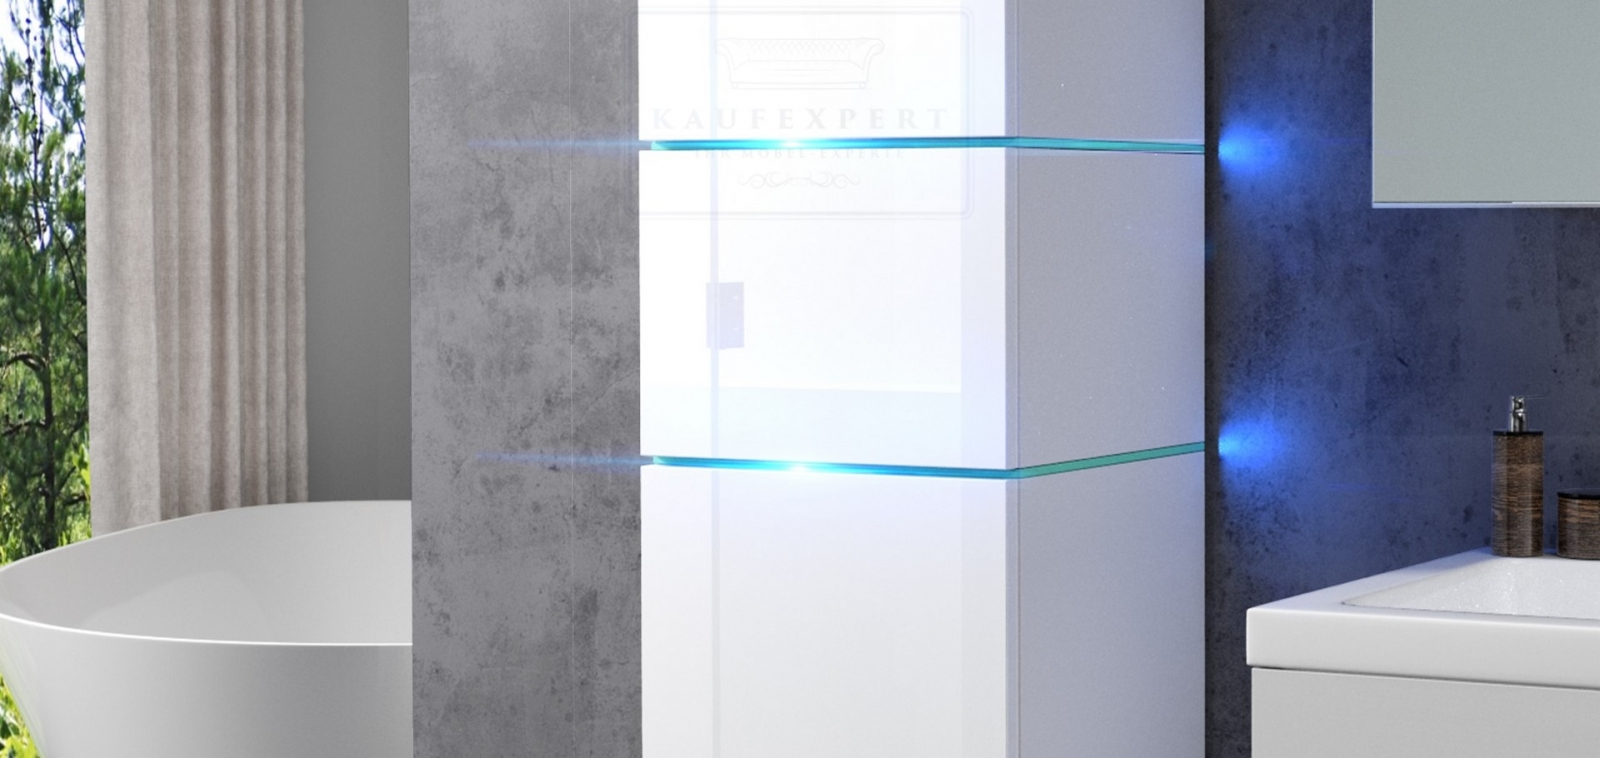 kaufexpert - badmöbel-set ledox 170 cm weiß hochglanz keramik, Badezimmer